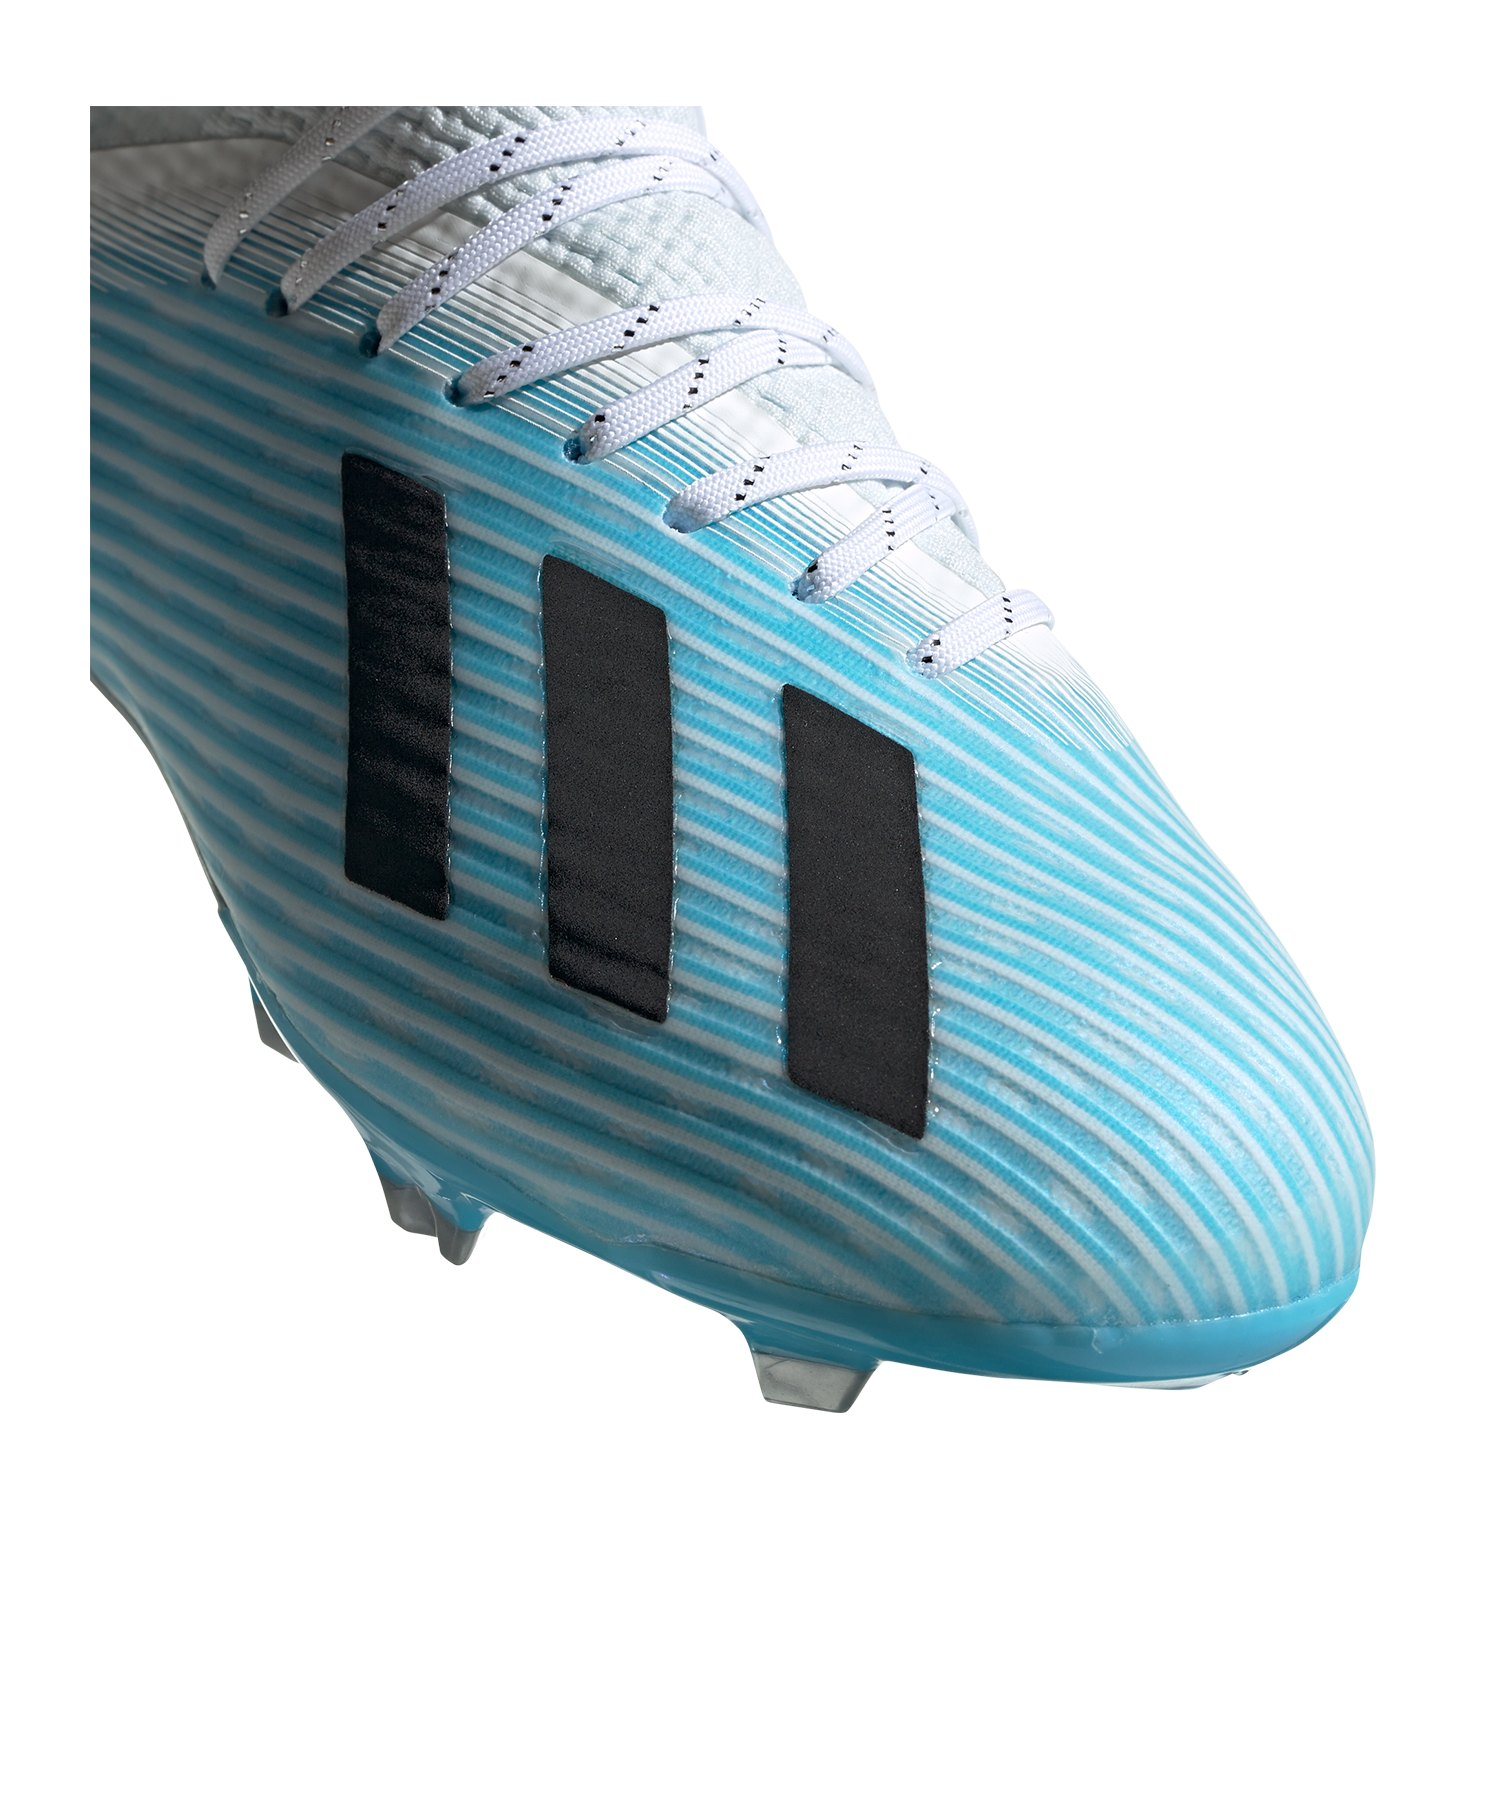 adidas Kinder Fußballschuh X 19.1 FG J silberrot